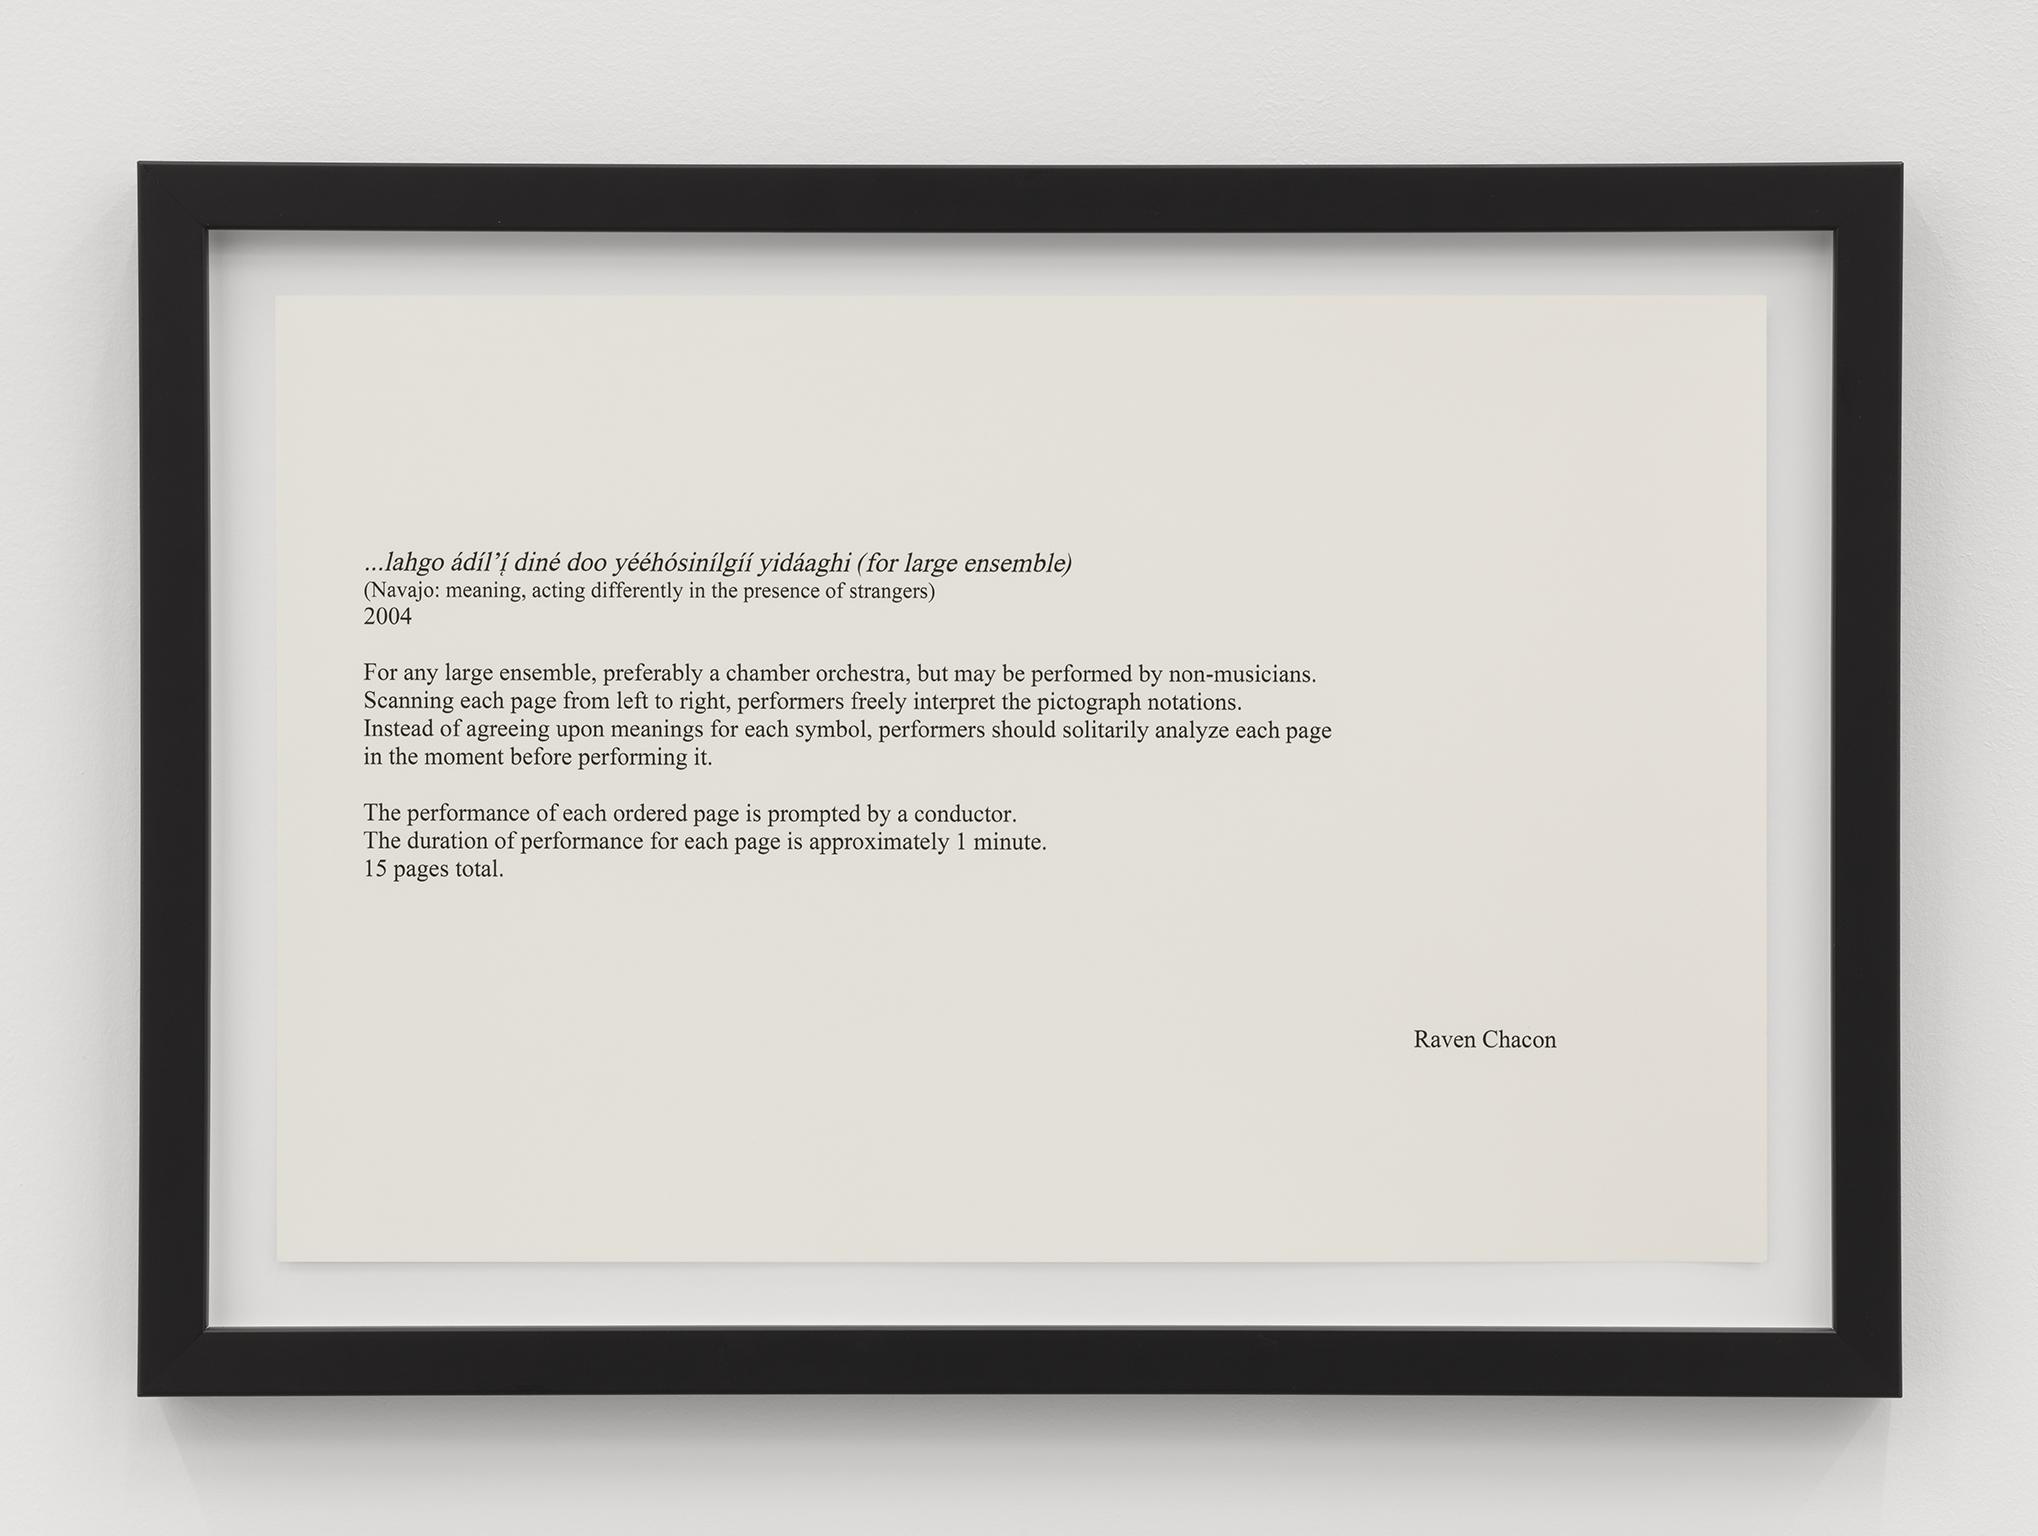 Raven Chacon, …lahgo adil'i dine doo yeehosinilgii yidaaghi, 2004, 16 inkjet prints, each 14 x 20 in. (36 x 51 cm) by